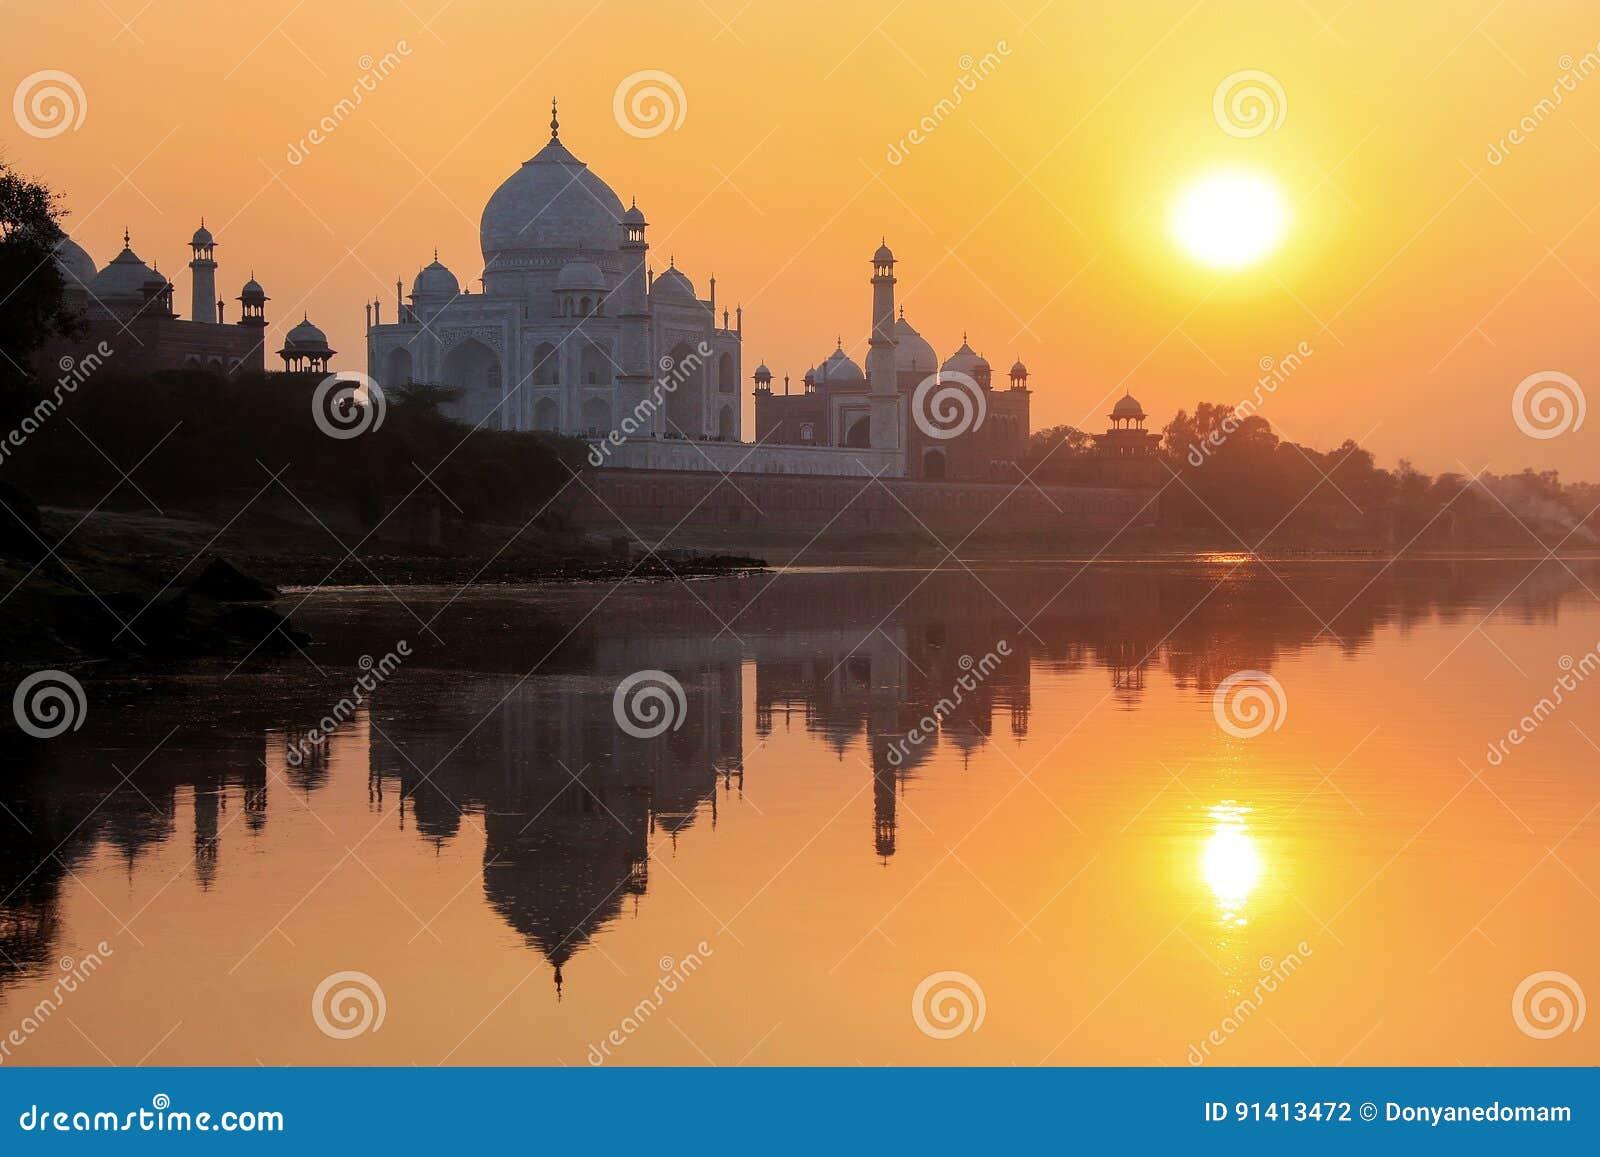 Taj Mahal που απεικονίζεται στον ποταμό Yamuna στο ηλιοβασίλεμα σε Agra, Ινδία